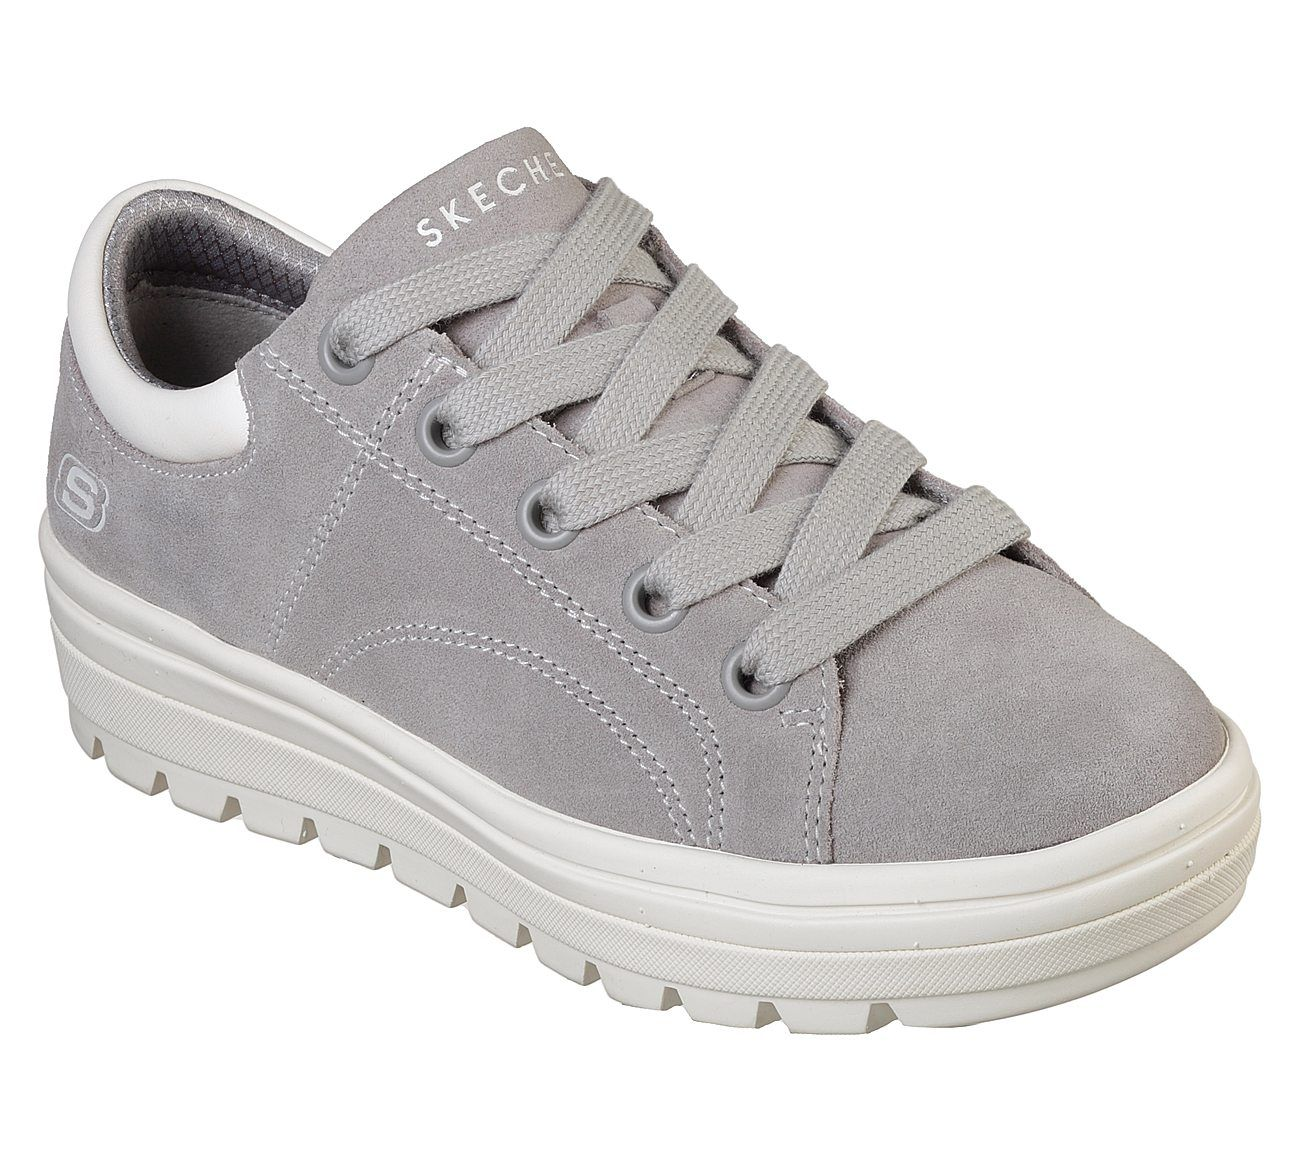 44192724c71ec Buy SKECHERS Street Cleat - Back Again SKECHER Street Shoes only  62.00